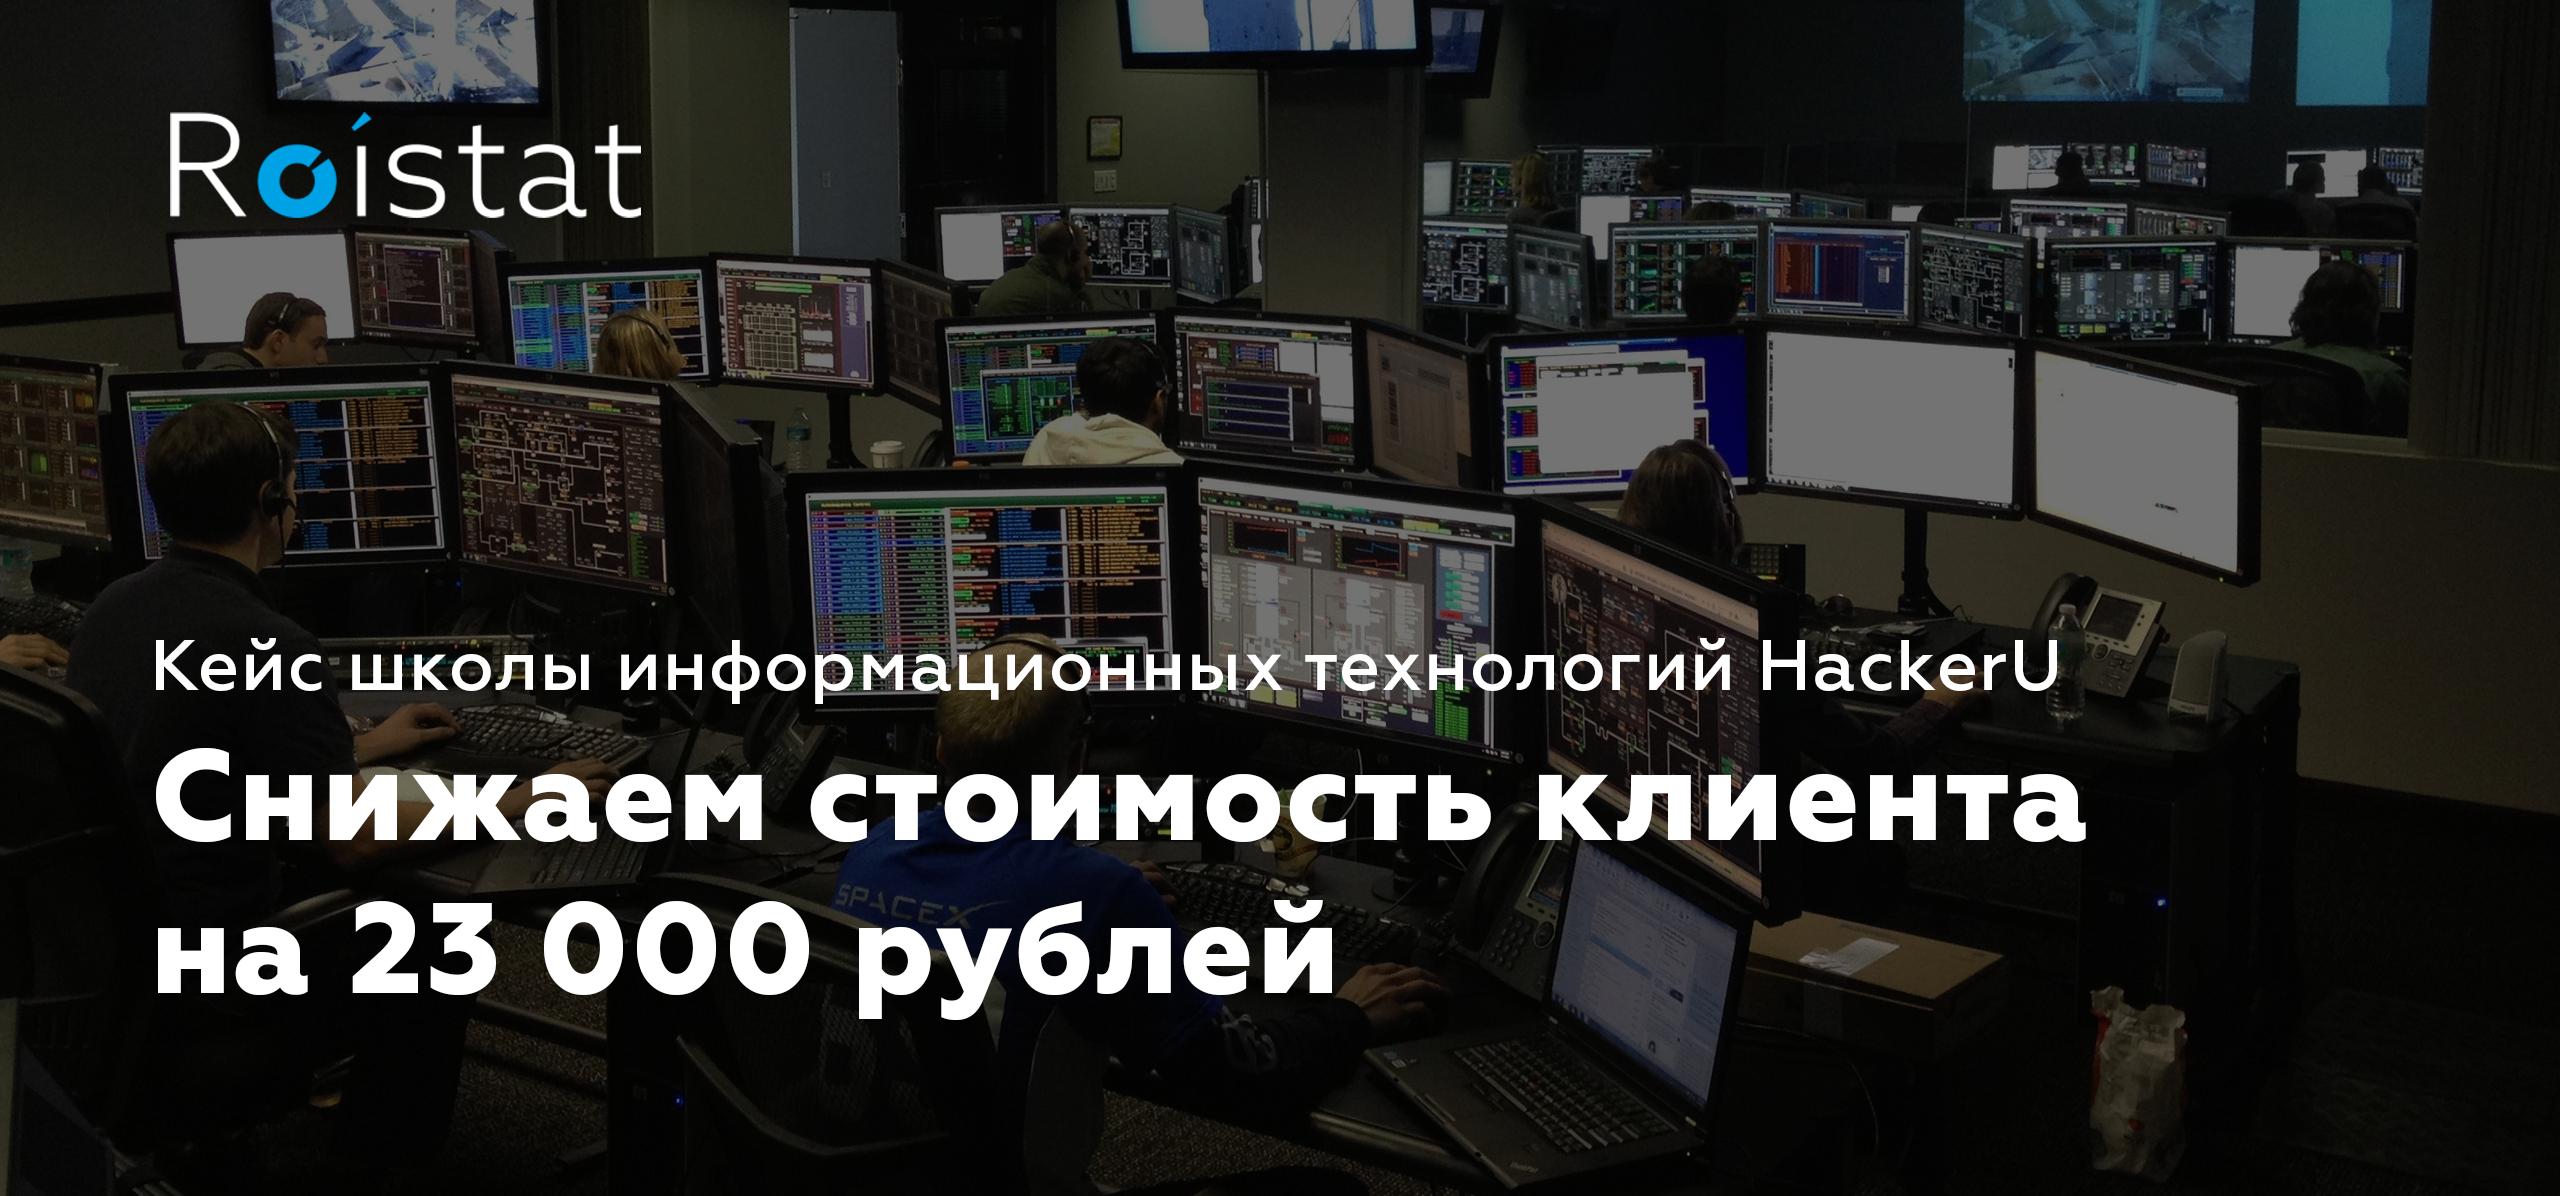 Кейс школы информационных технологий HackerU